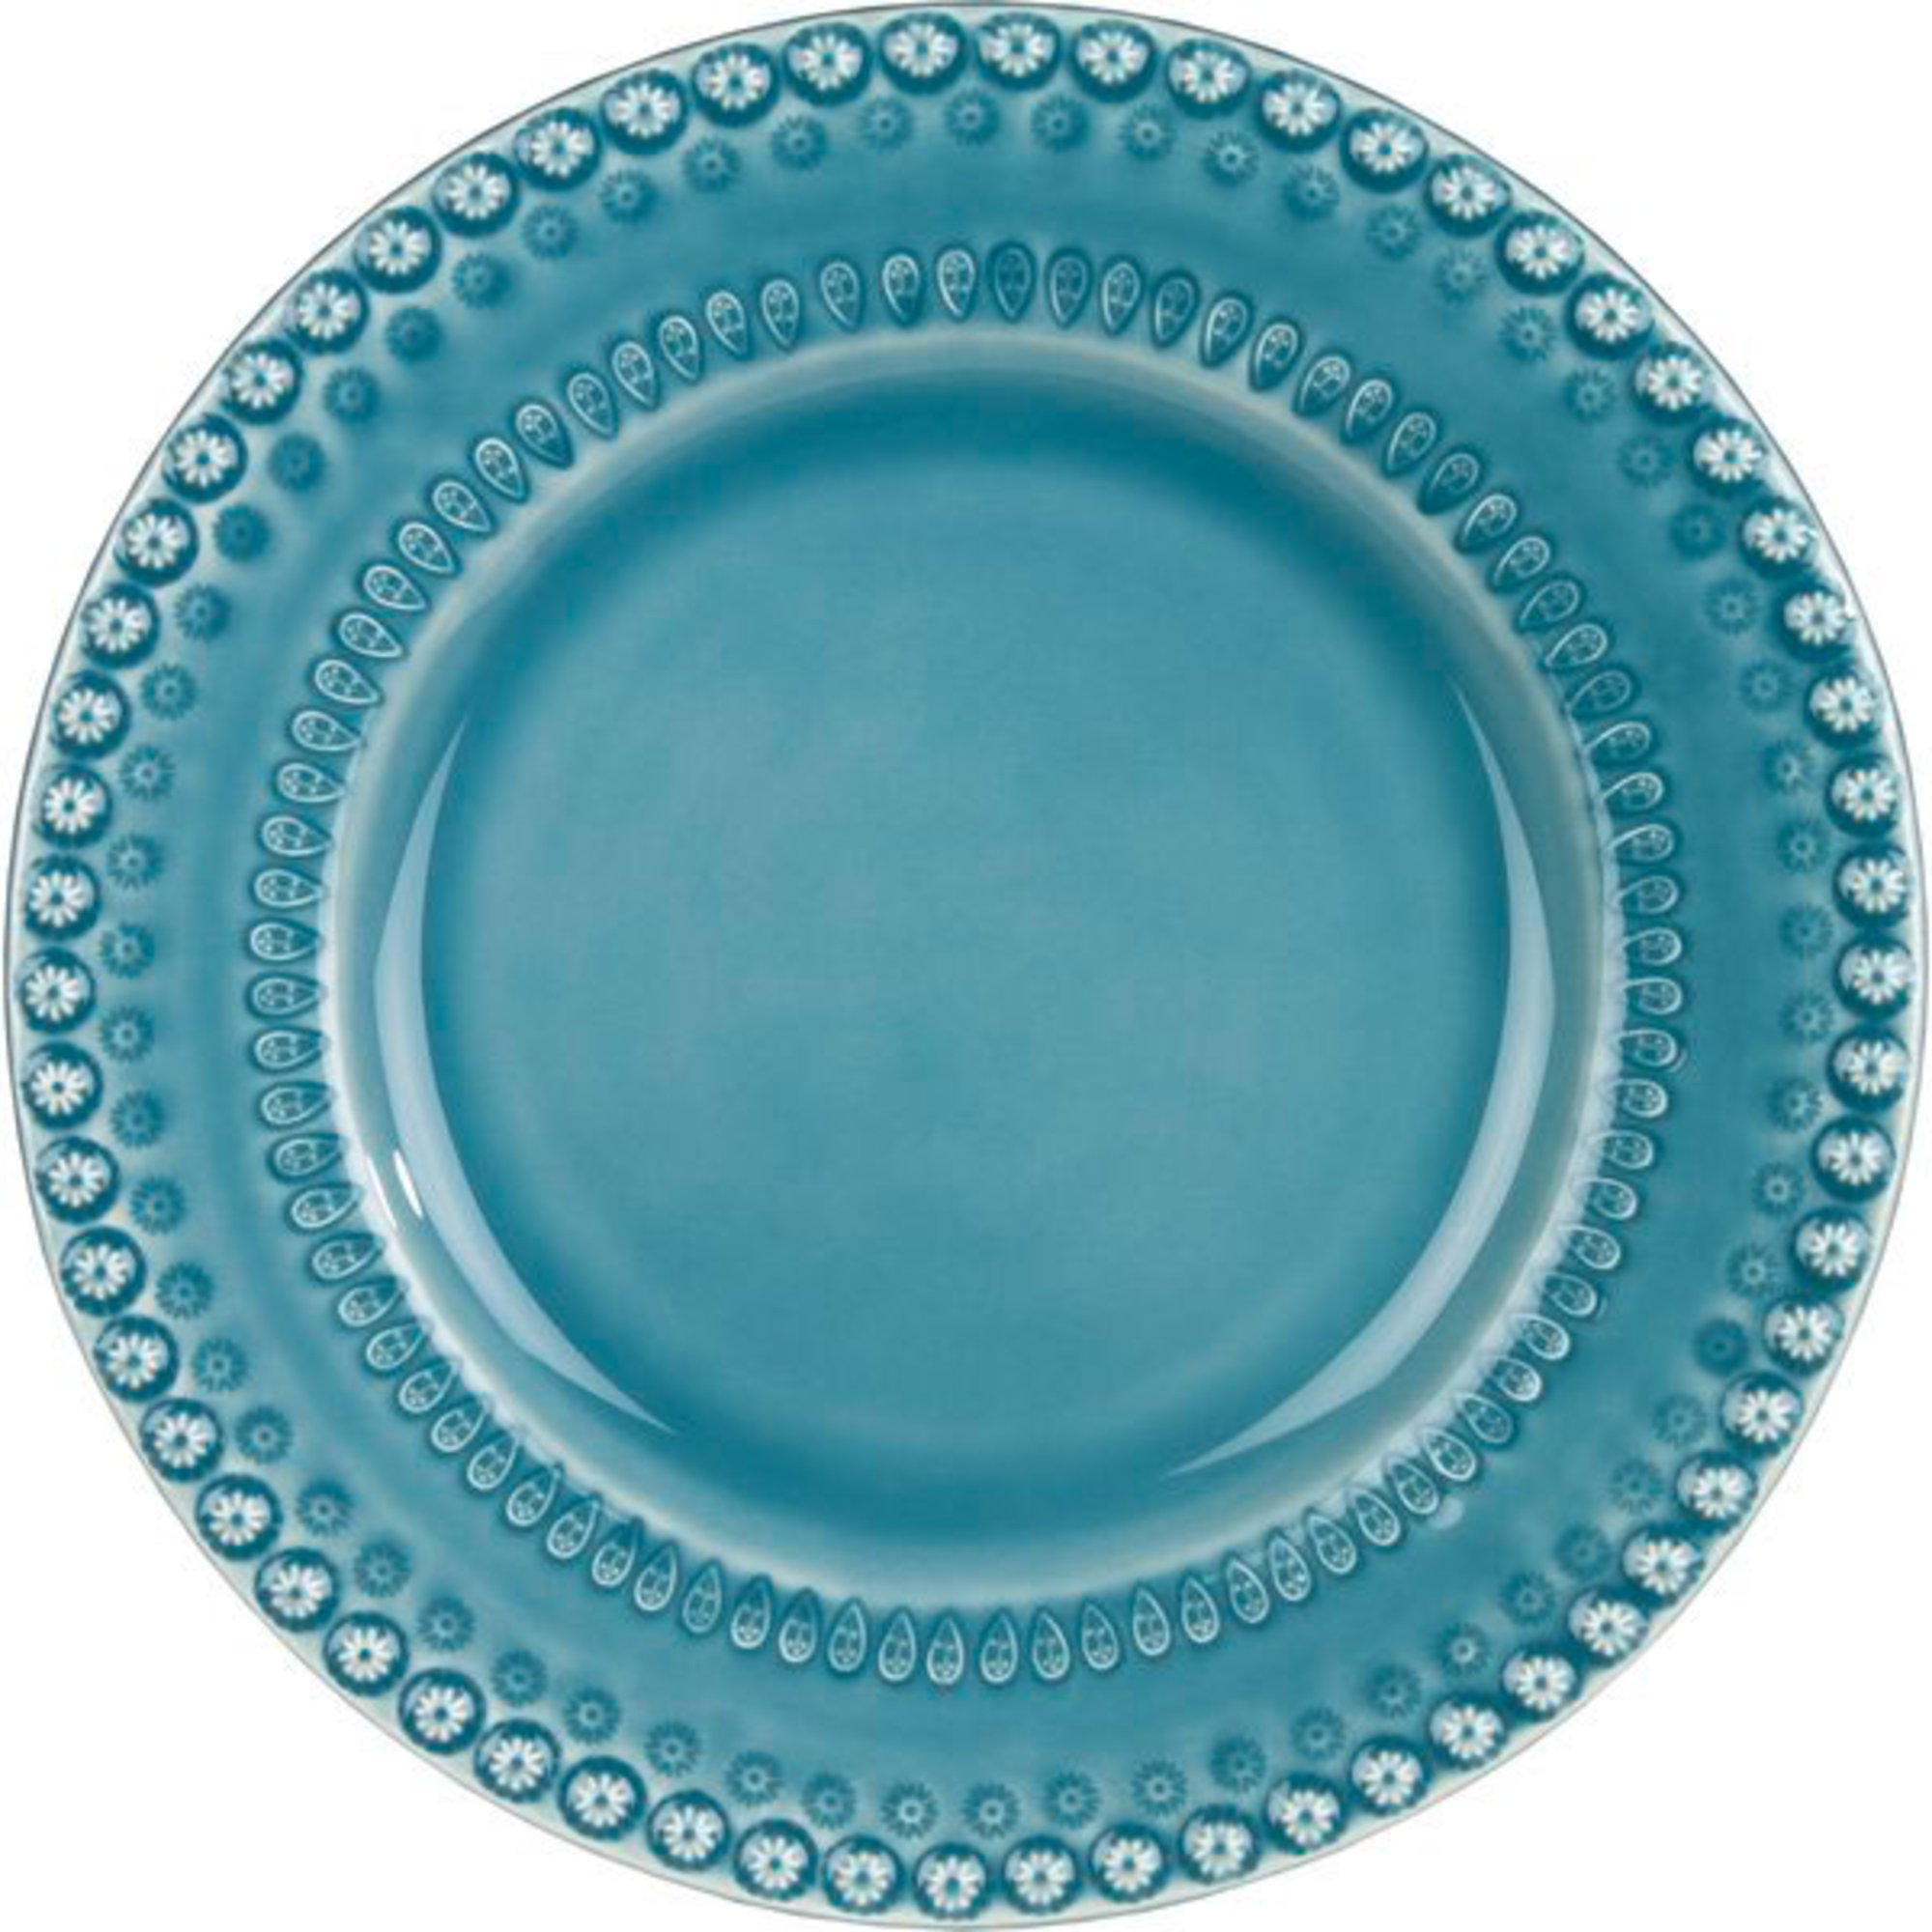 PotteryJo Daisy Middagstallrik 2 st Dusty Blue